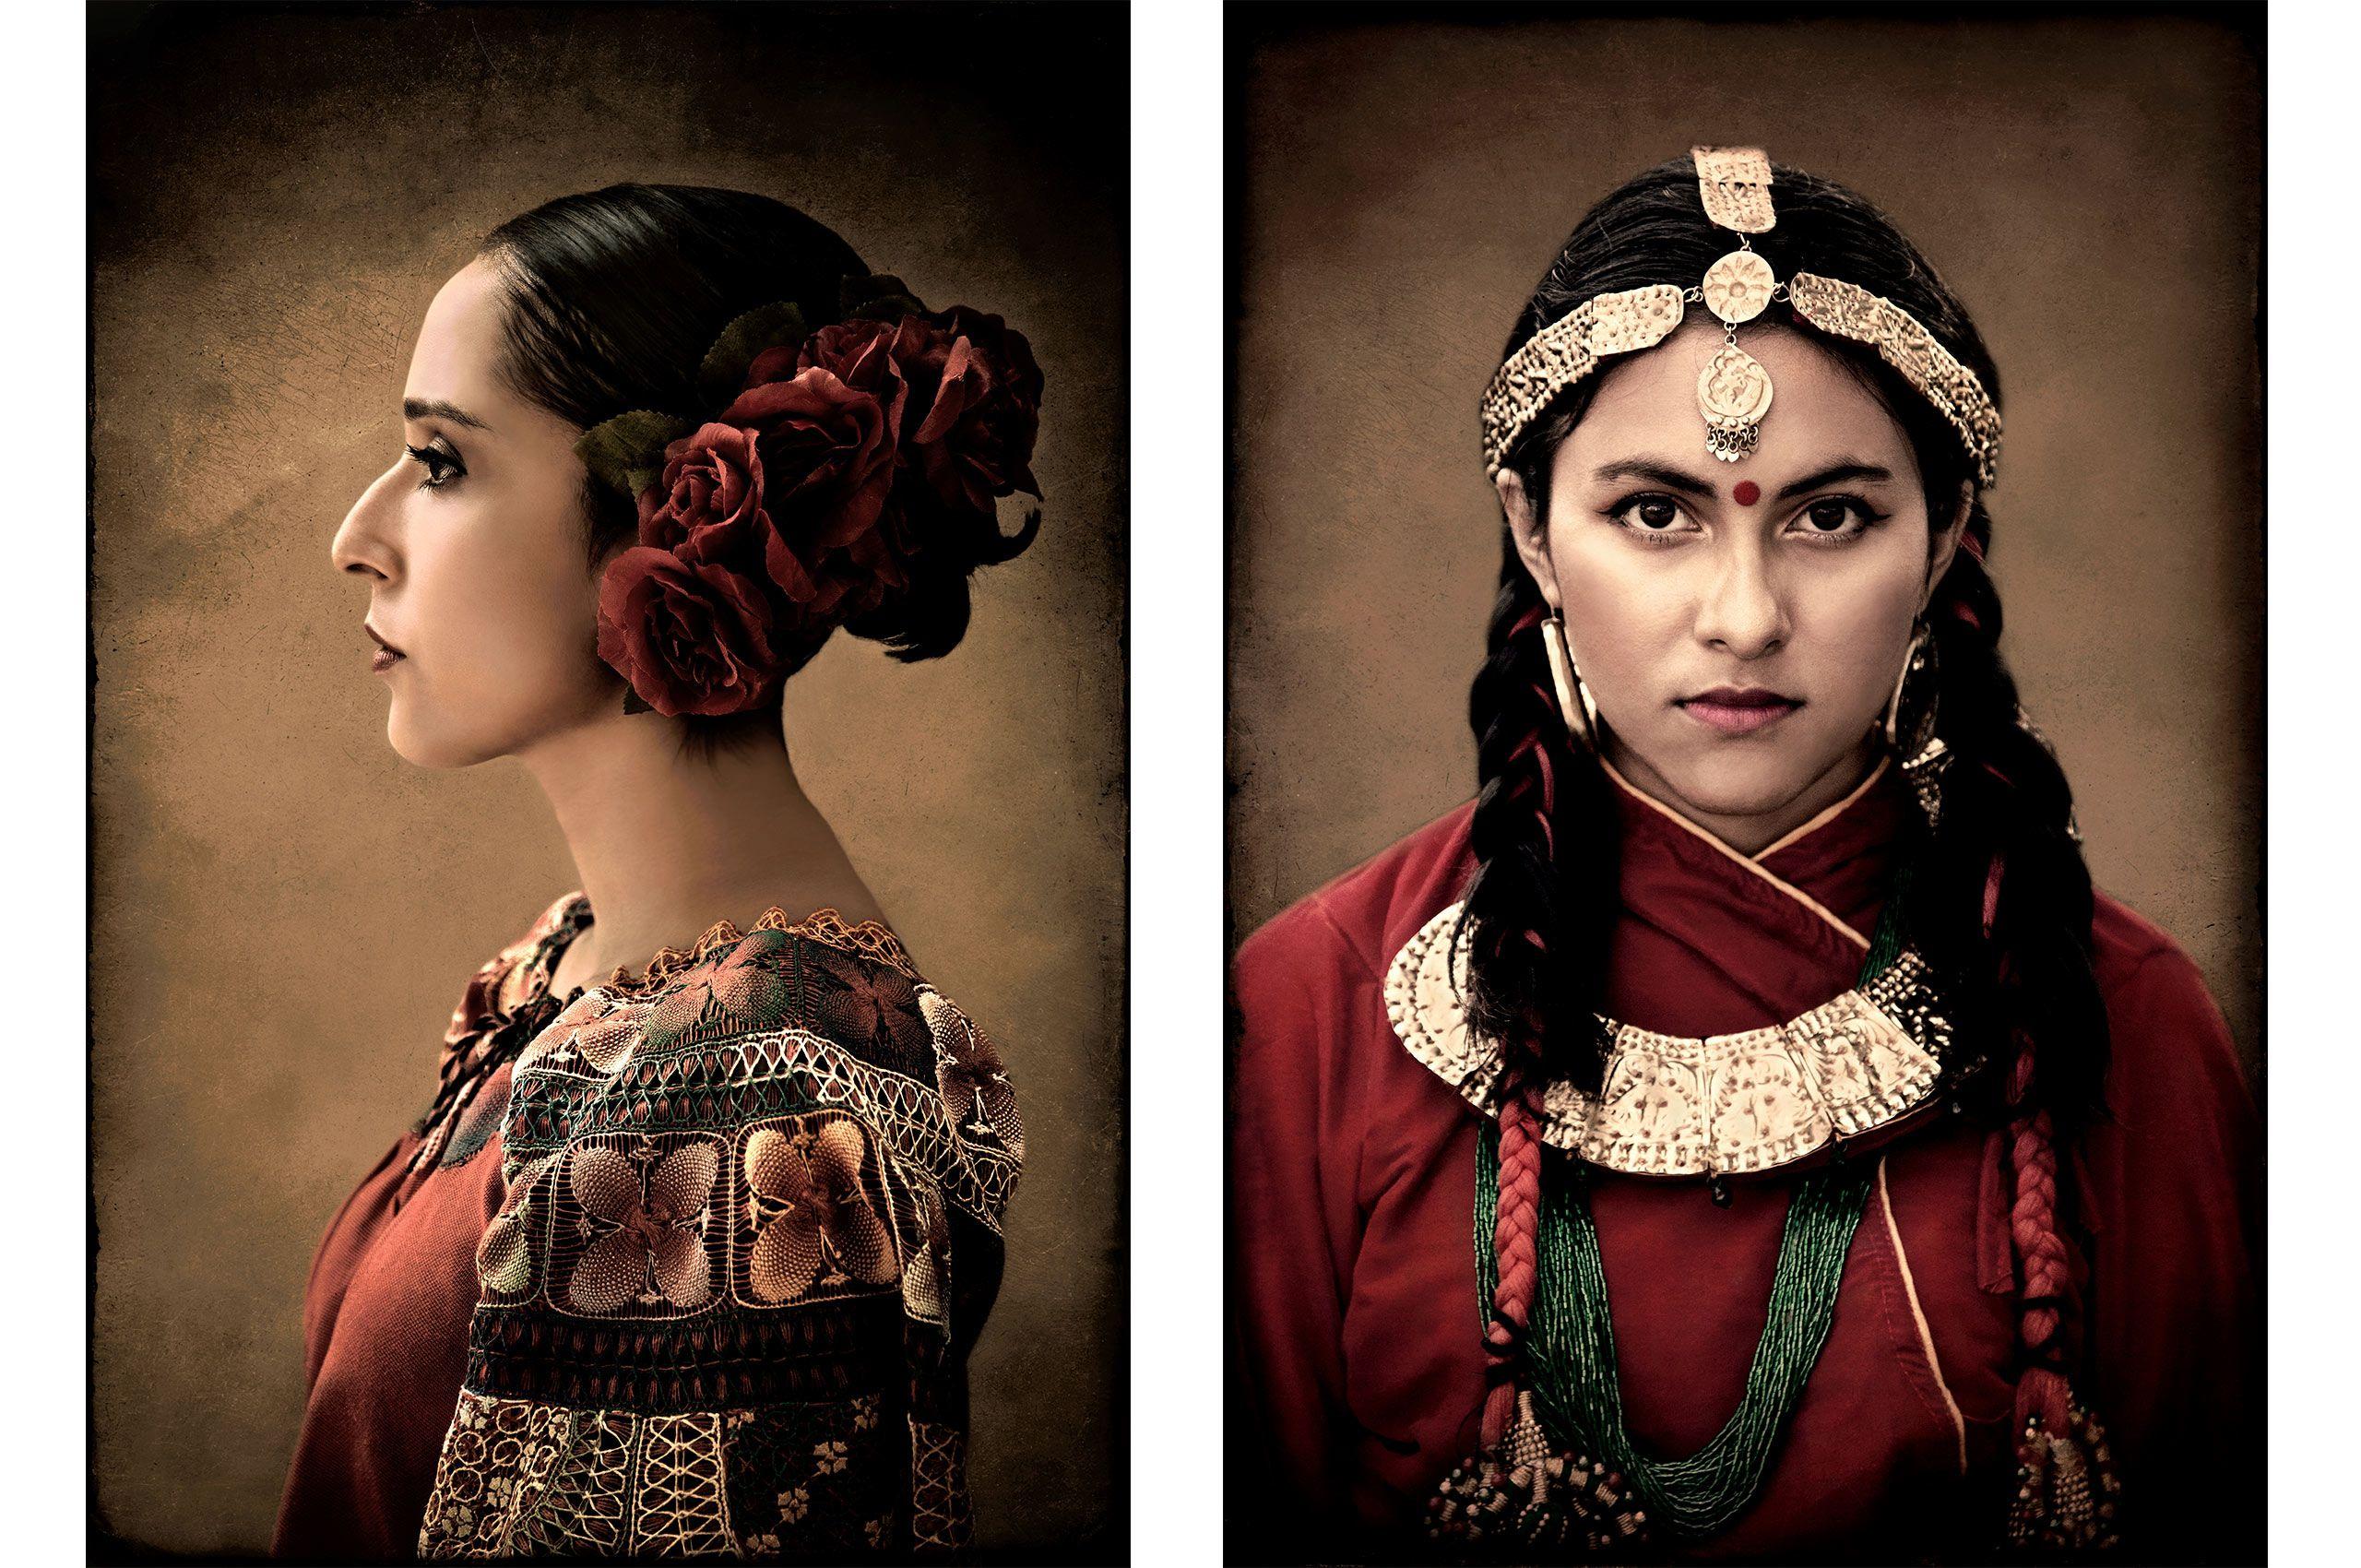 Amanda-Paraguayan Heritage and Akriti-Nepalese Heritage